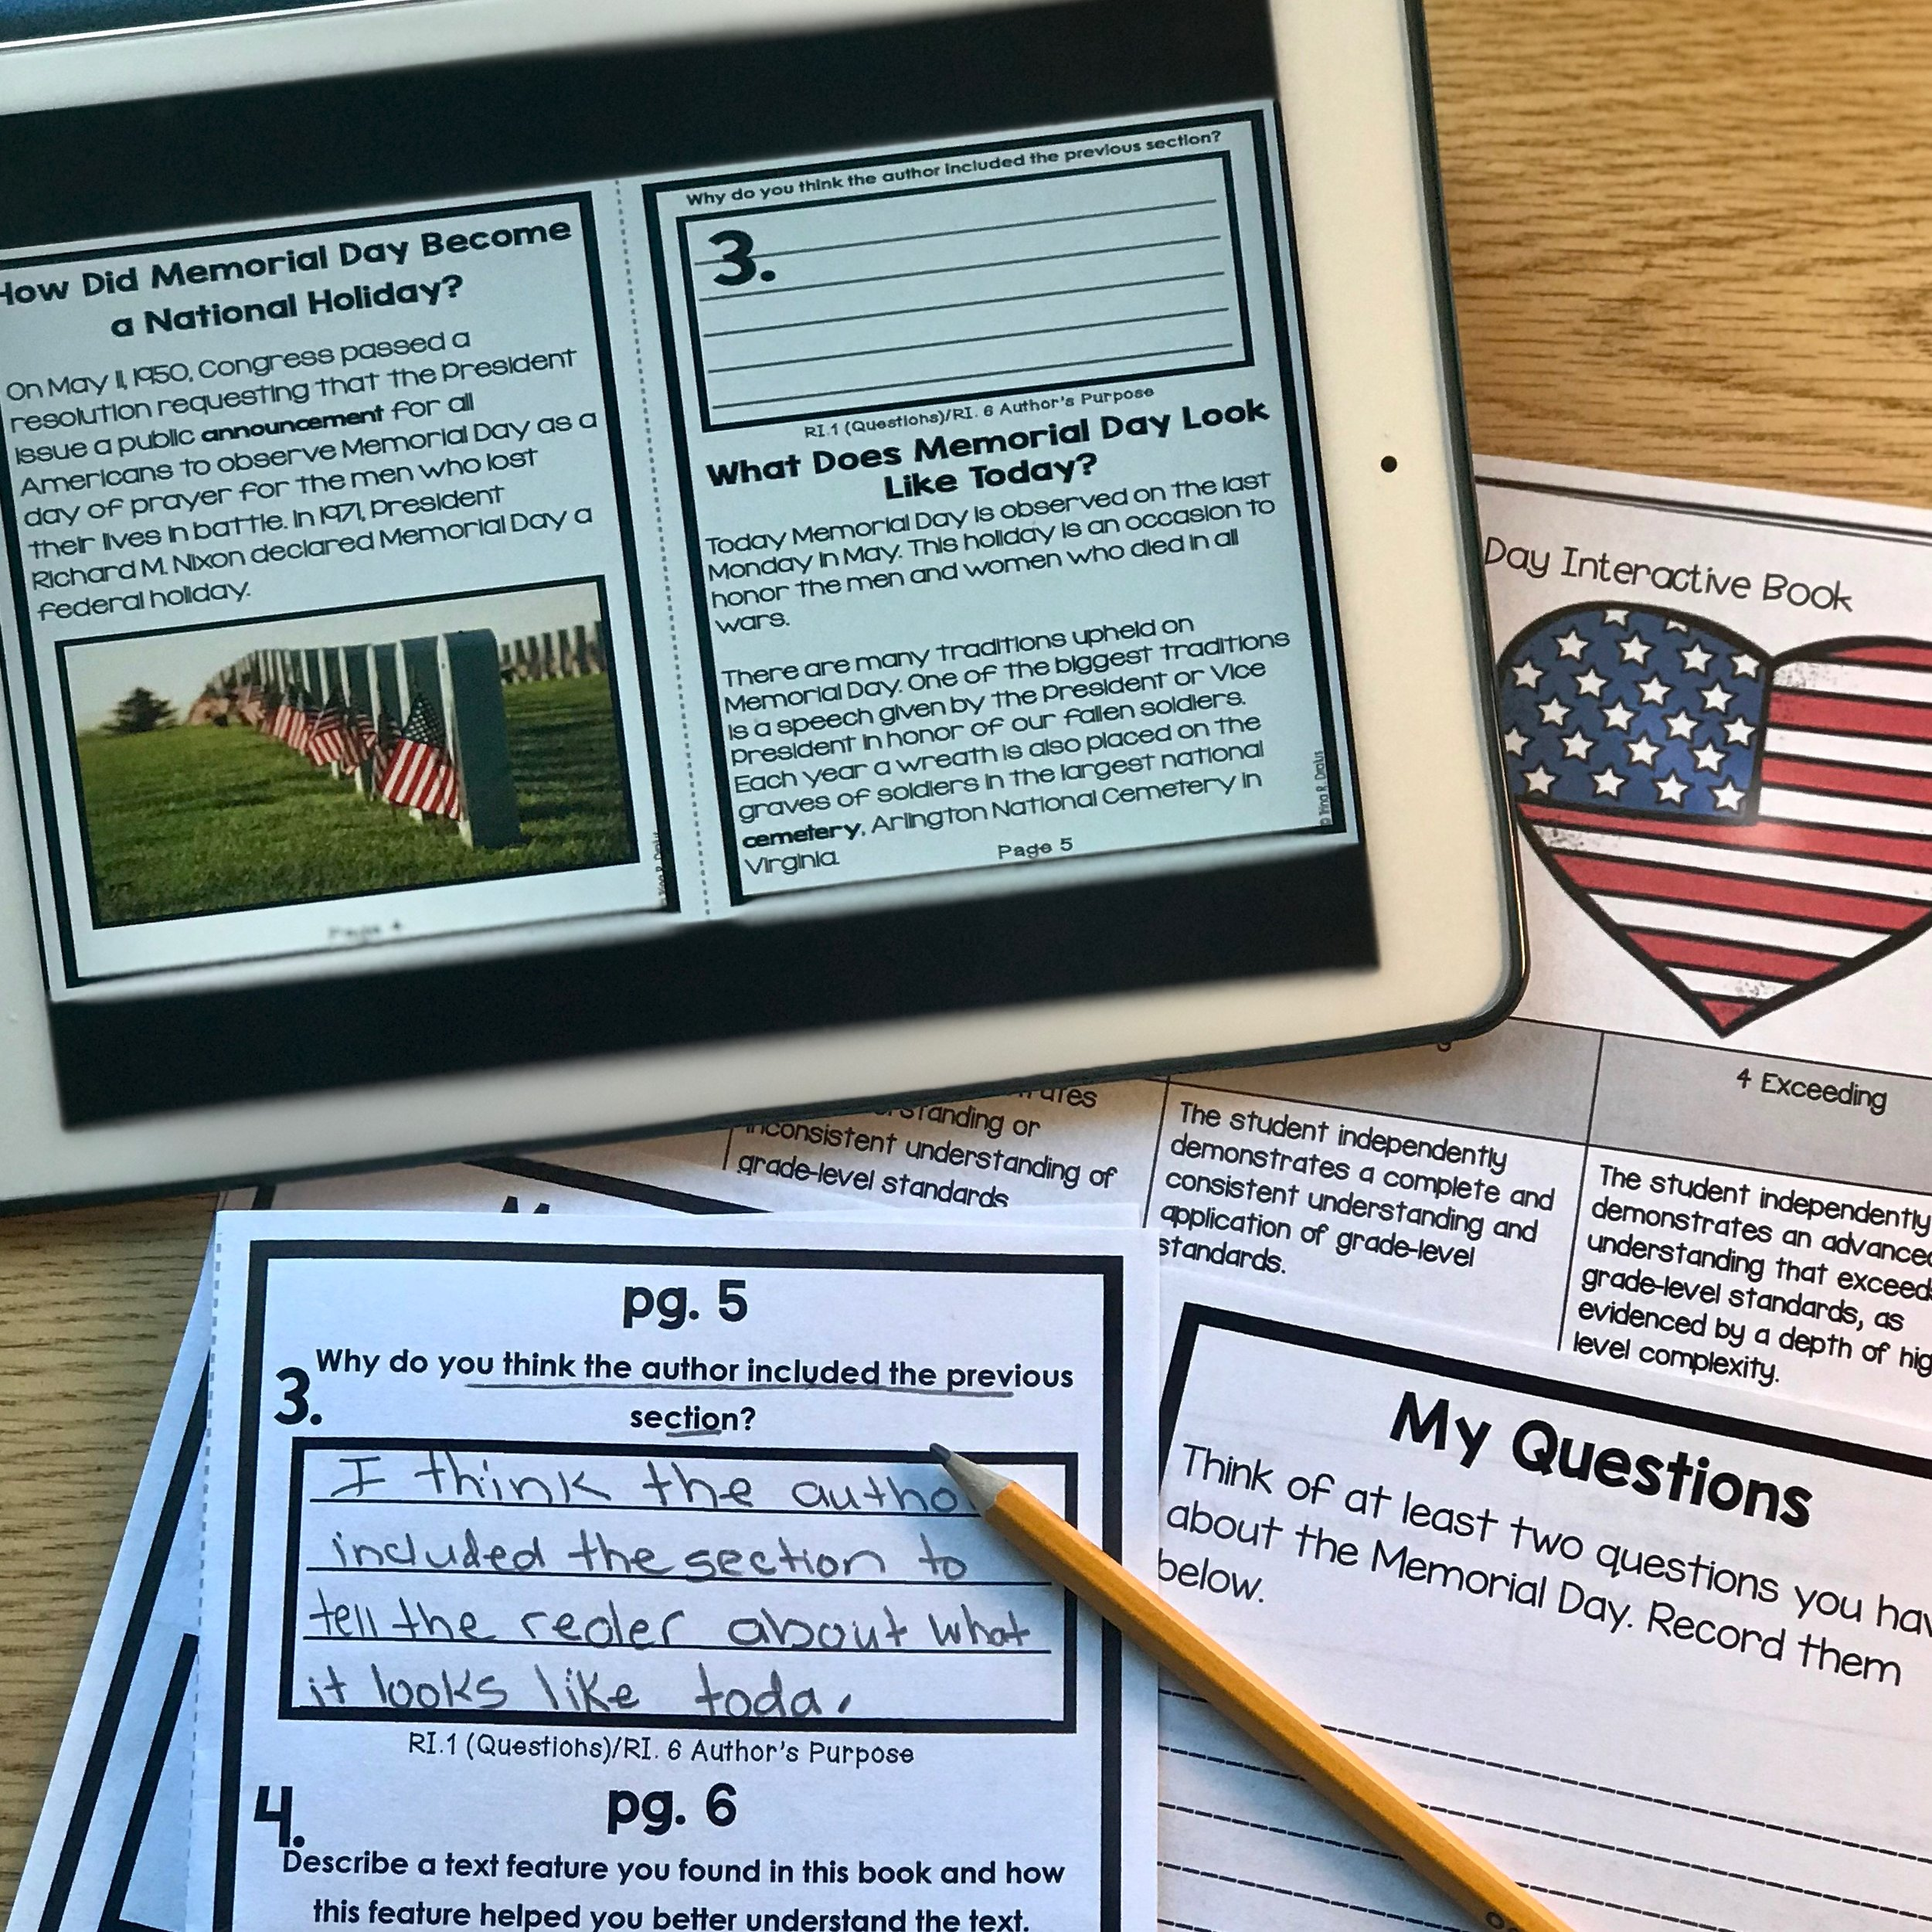 Digital Science and Social Studies with options of 100% paperless or 50% paperless #digitalscience #digitalsocialstudies #onetoone #googleclassroom #teachers #secondgrade #thirdgrade